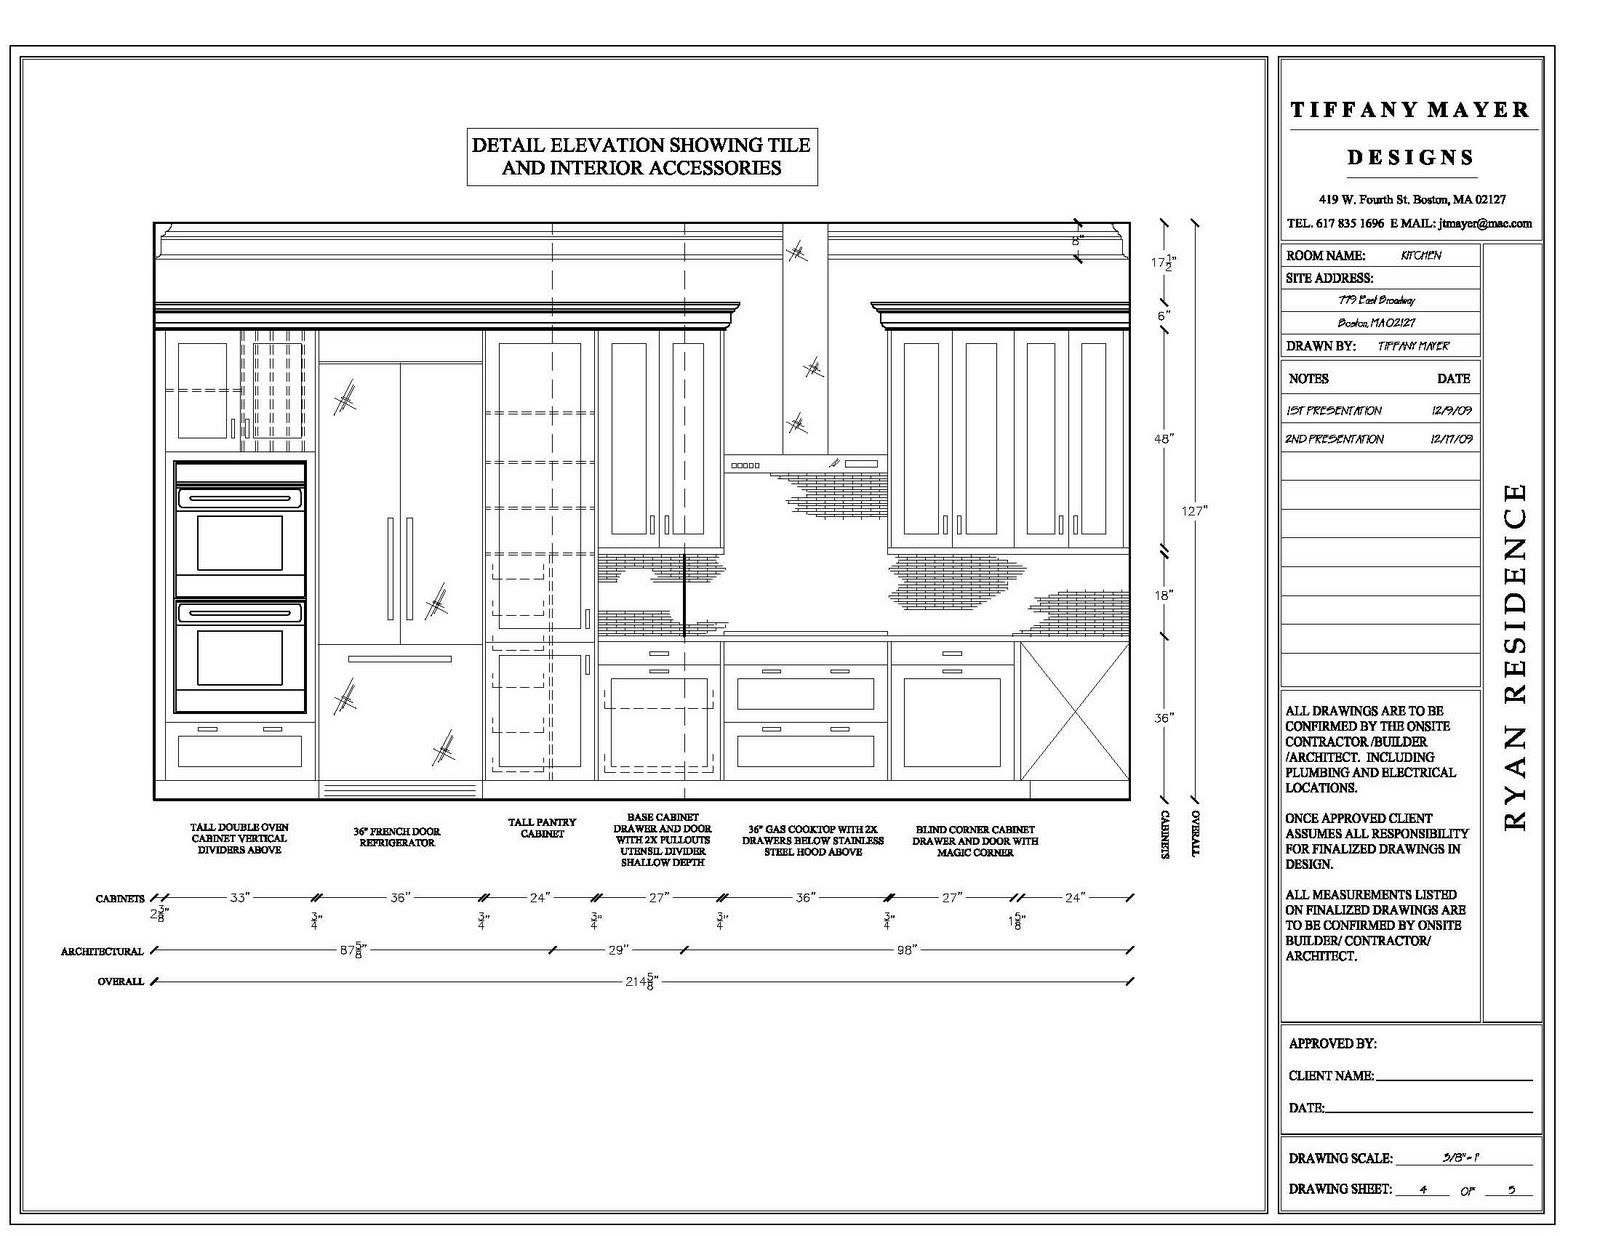 Exceptional Technology U0026 Interior Design Technology U0026 Interior Design | Tiffany Mayer  Designs